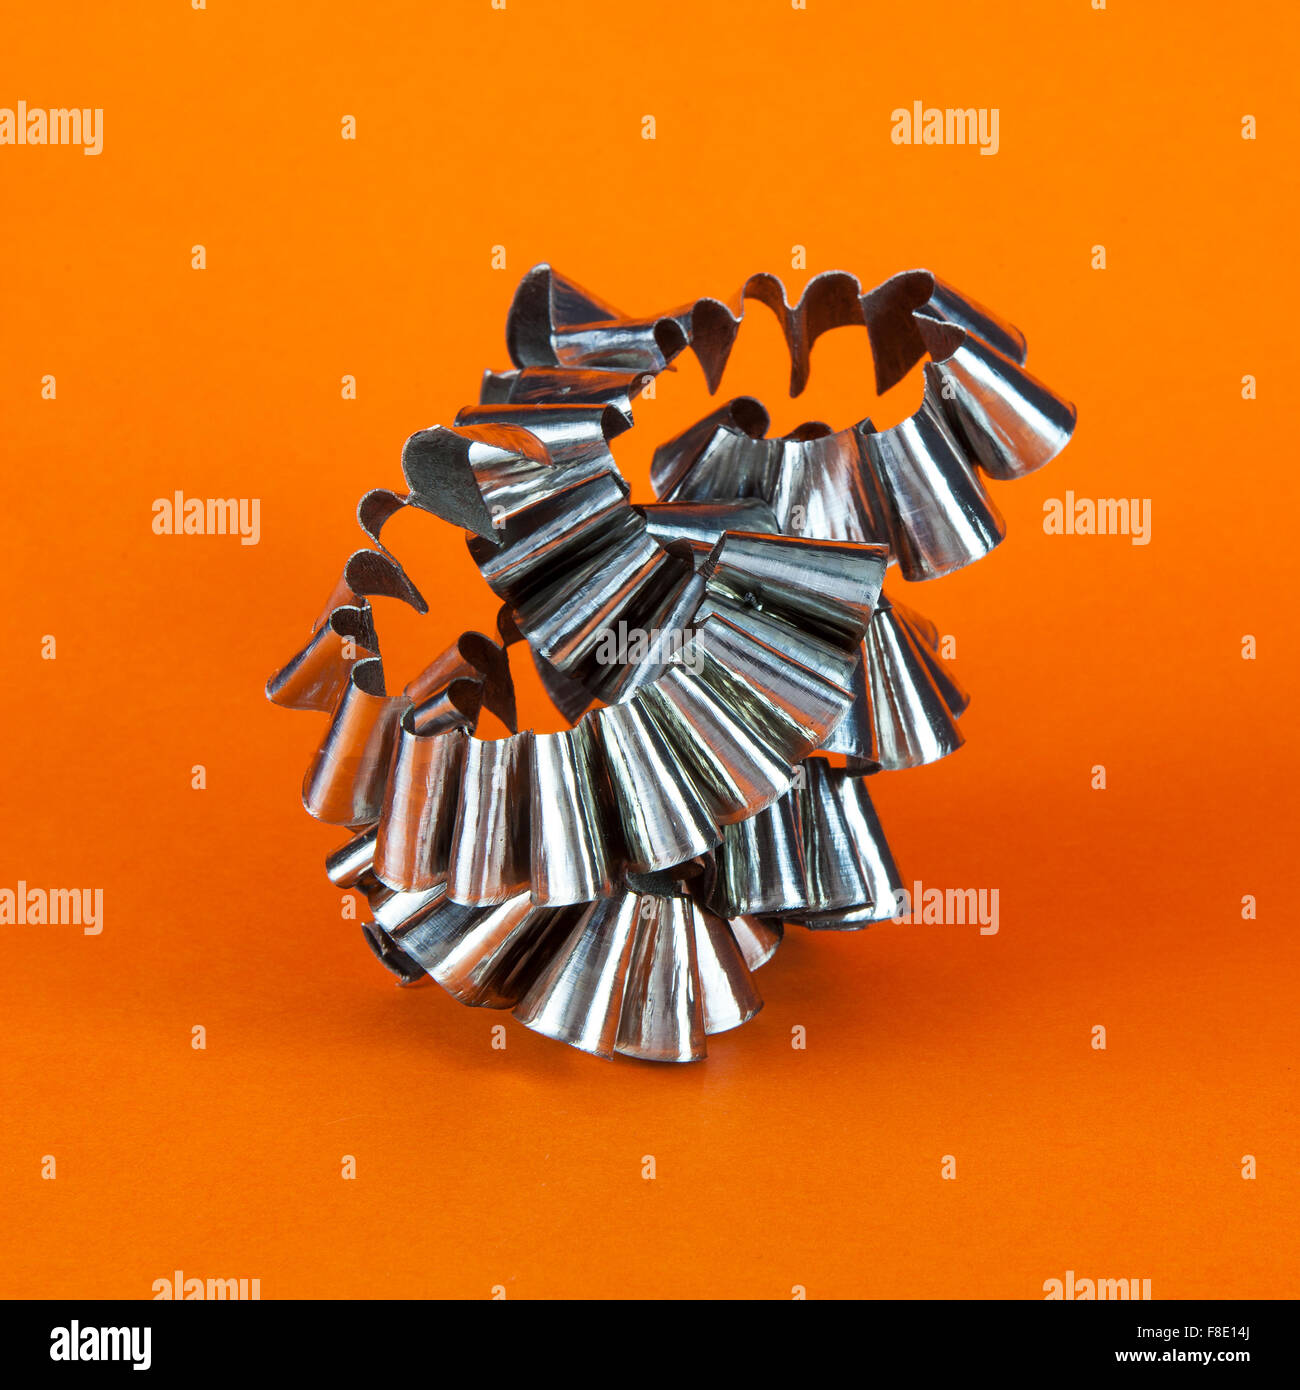 Metal Swarf on orange background - Stock Image